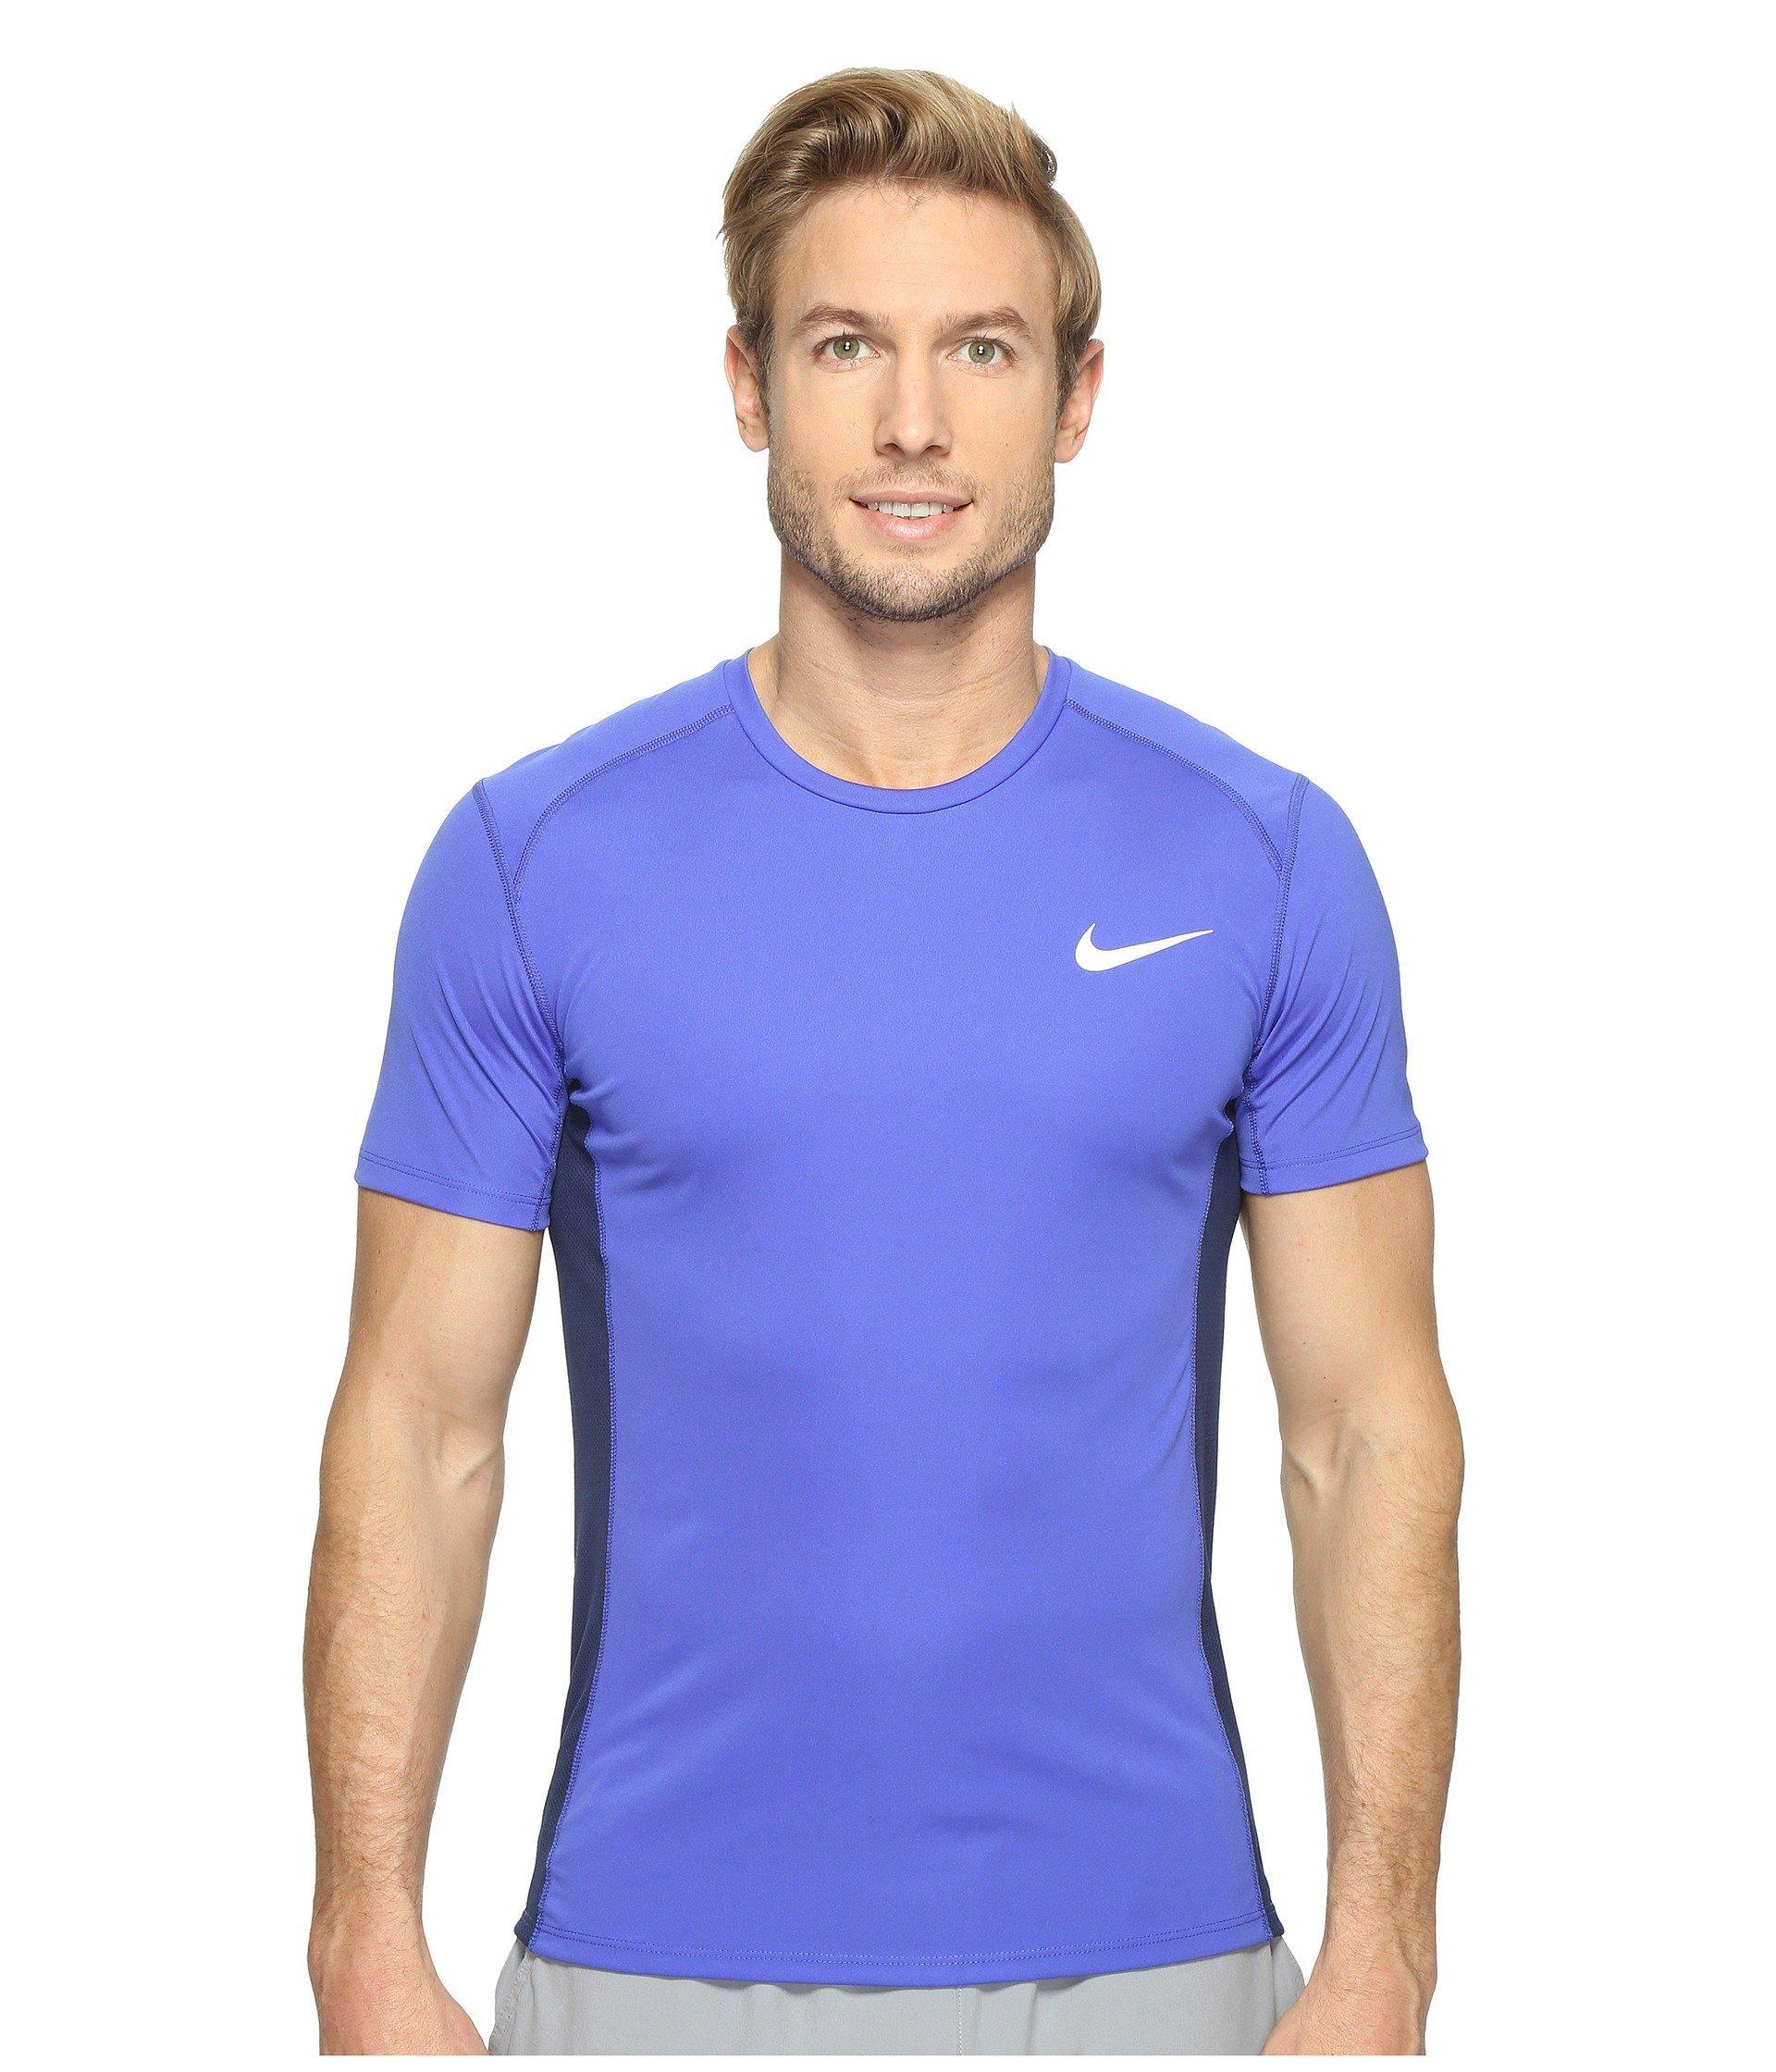 new arrival a2284 6d2e1 Nike Dry Miler Short Sleeve Running Top, Burgundy Ash Heather   ModeSens